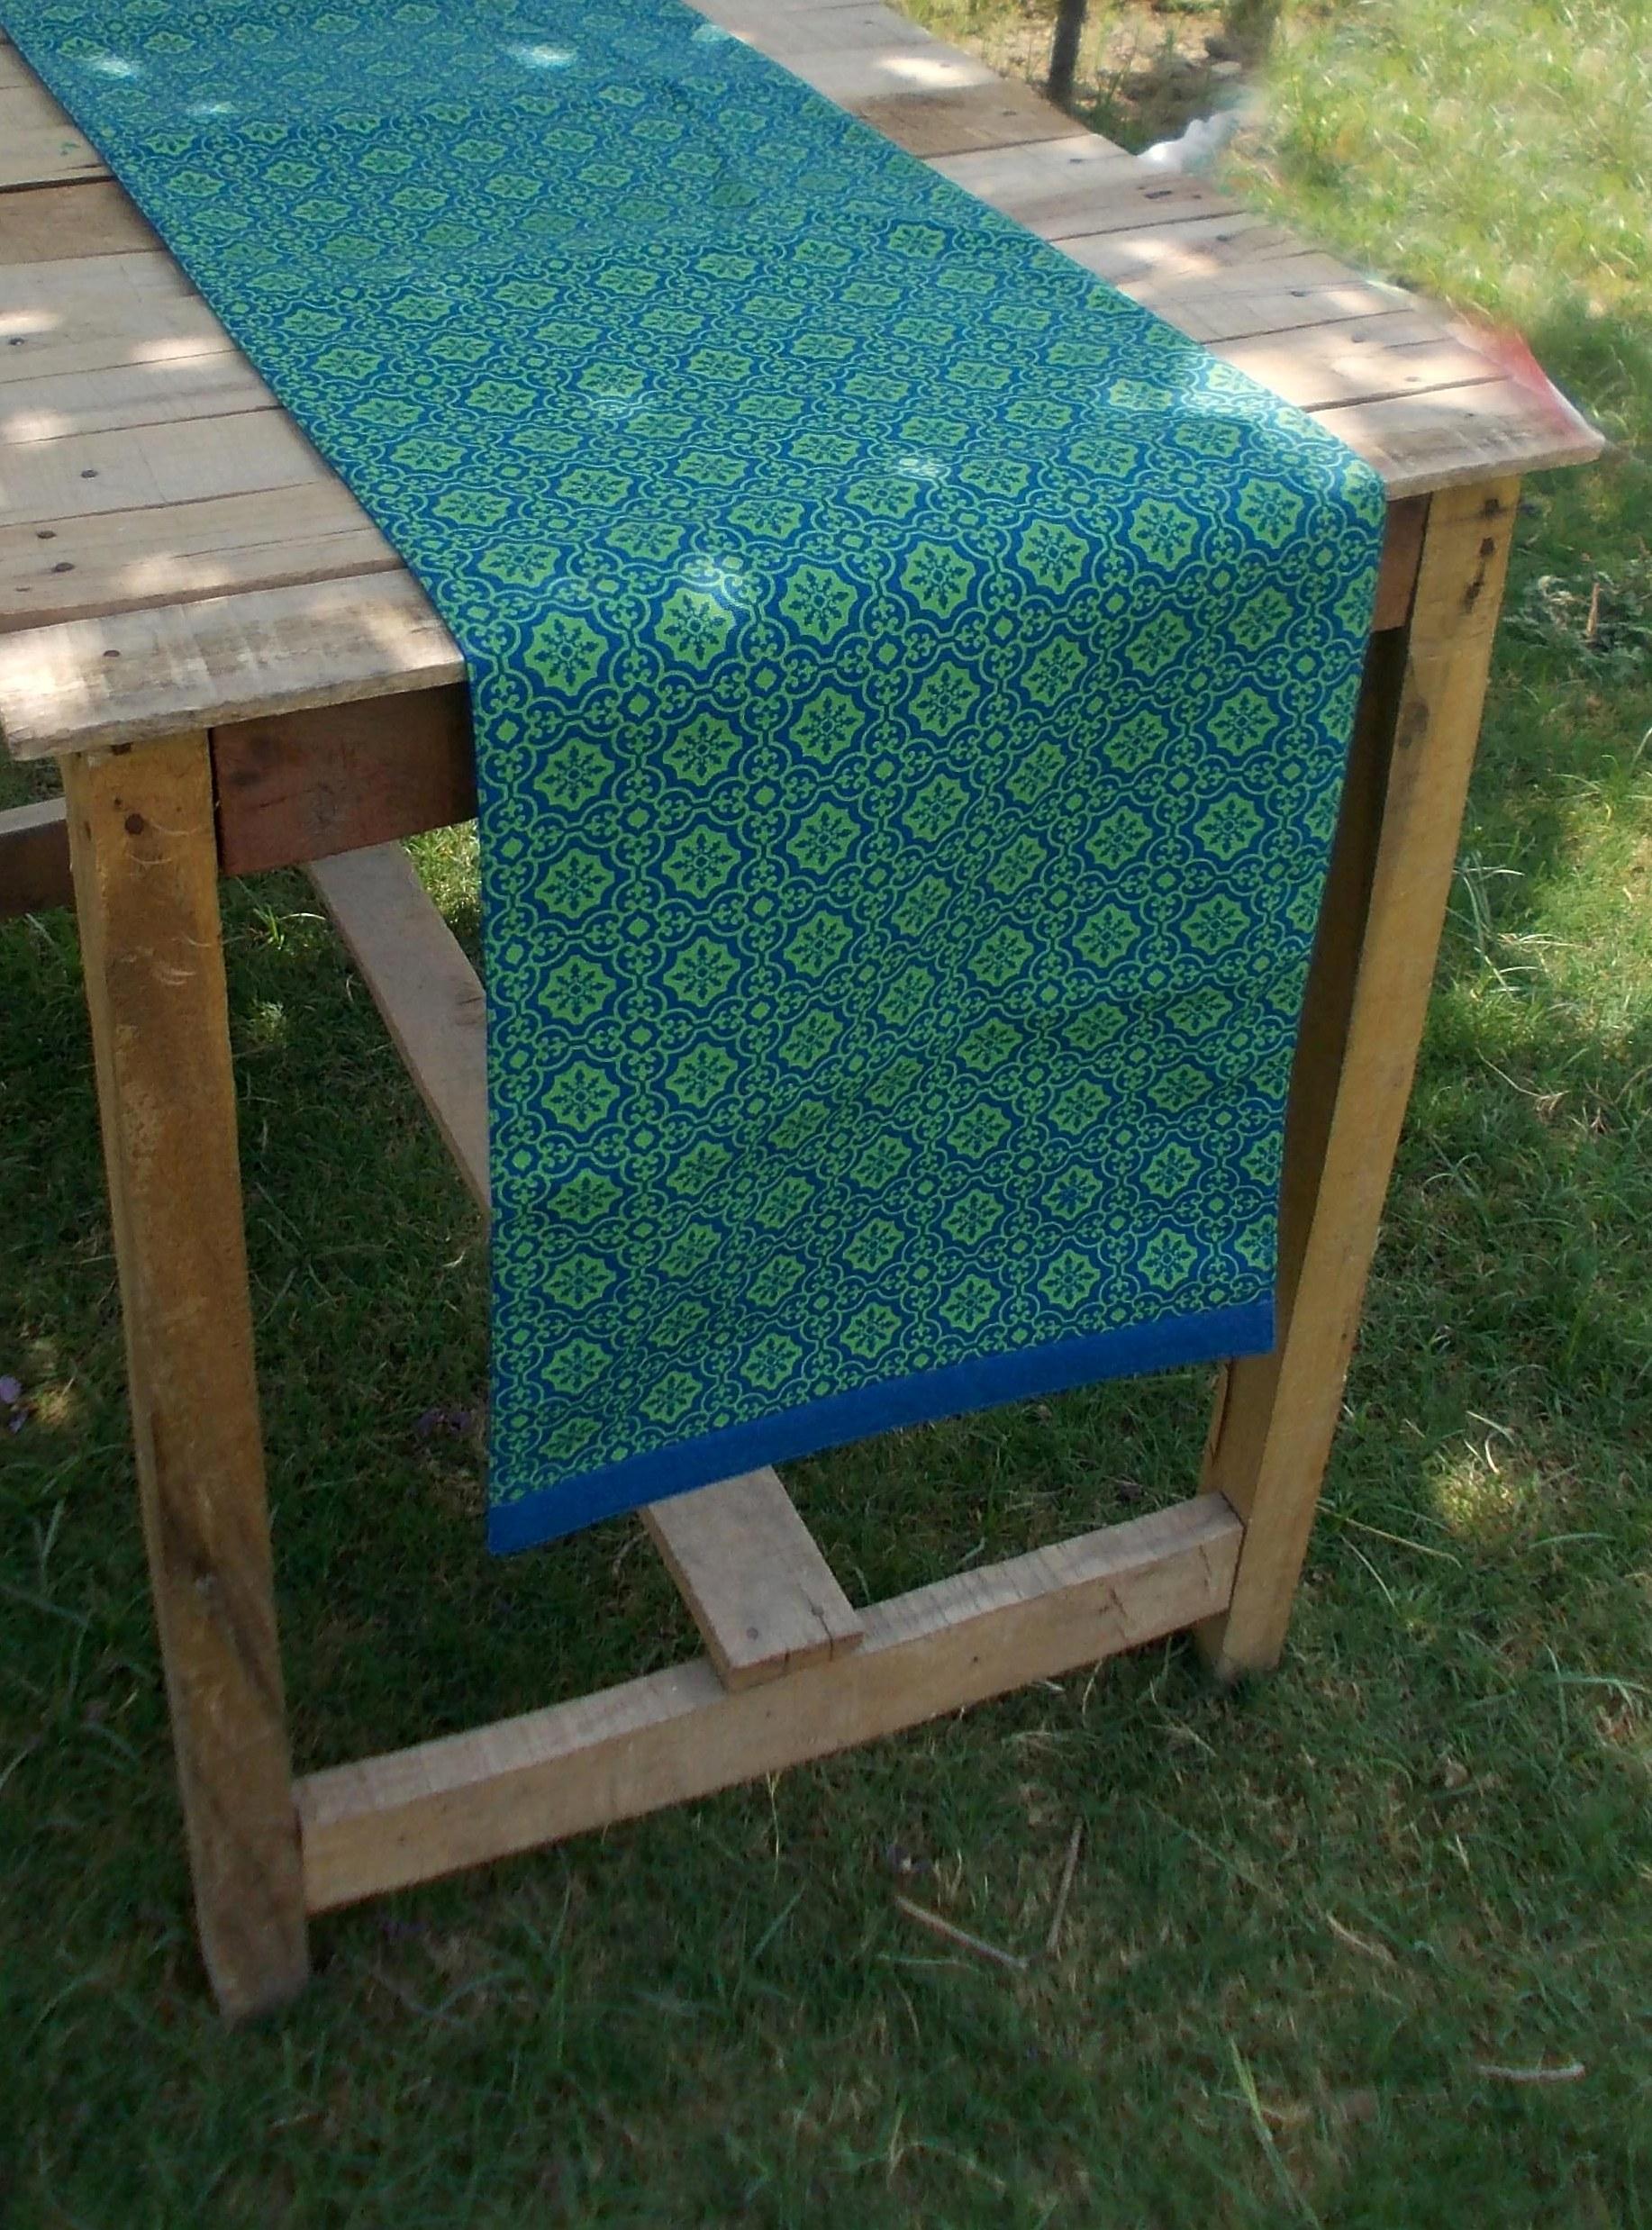 Blue and green- Tile print Table runner